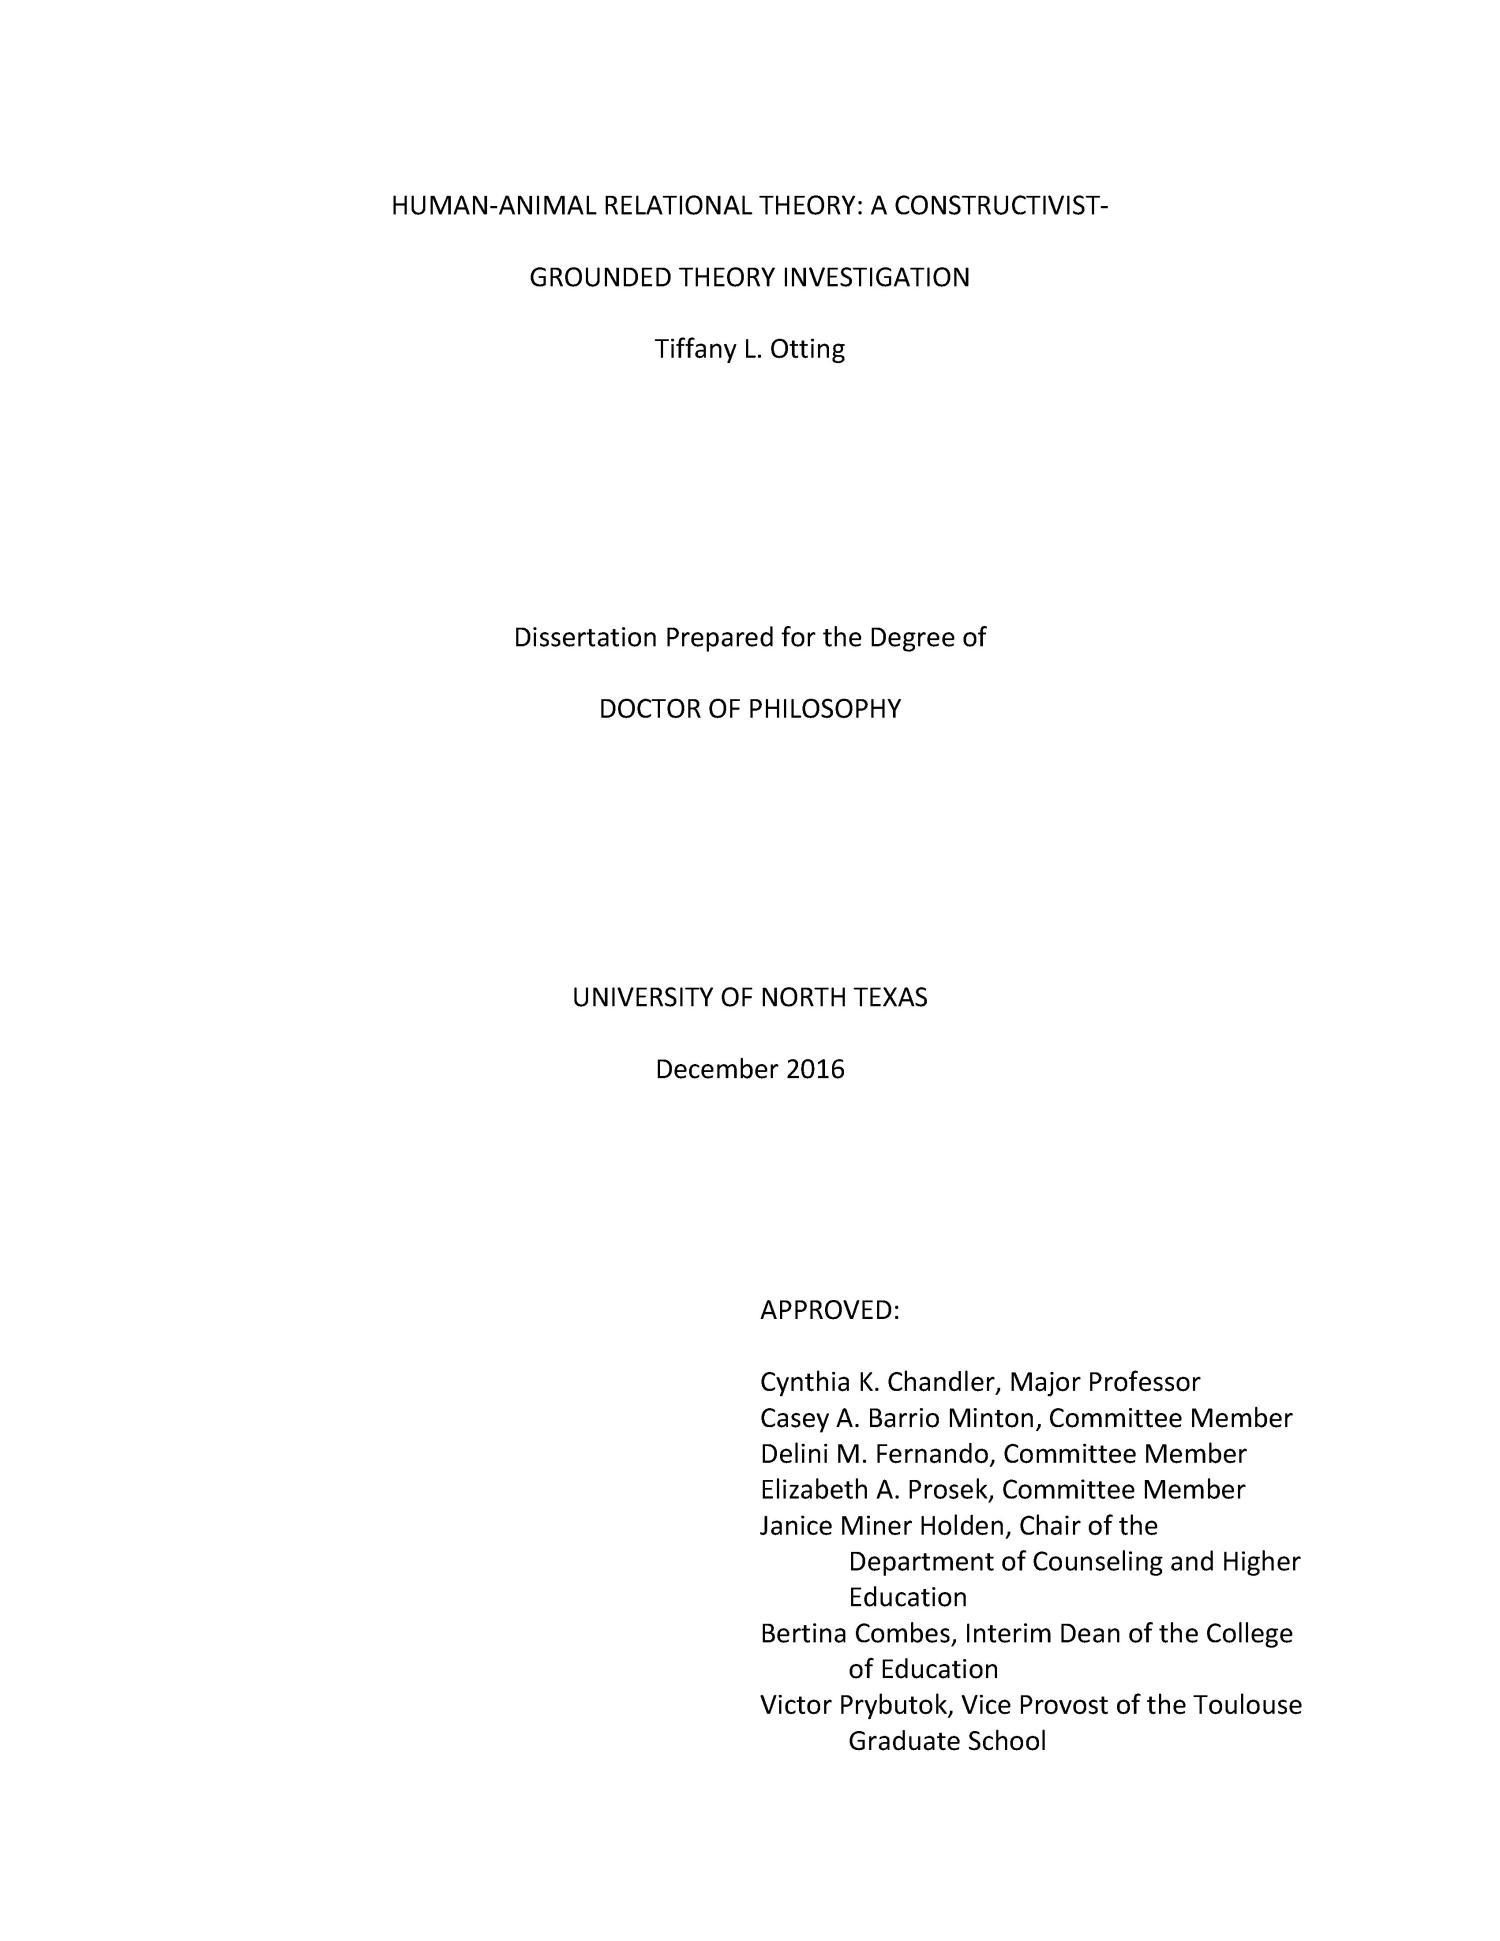 Constructivist grounded theory dissertation